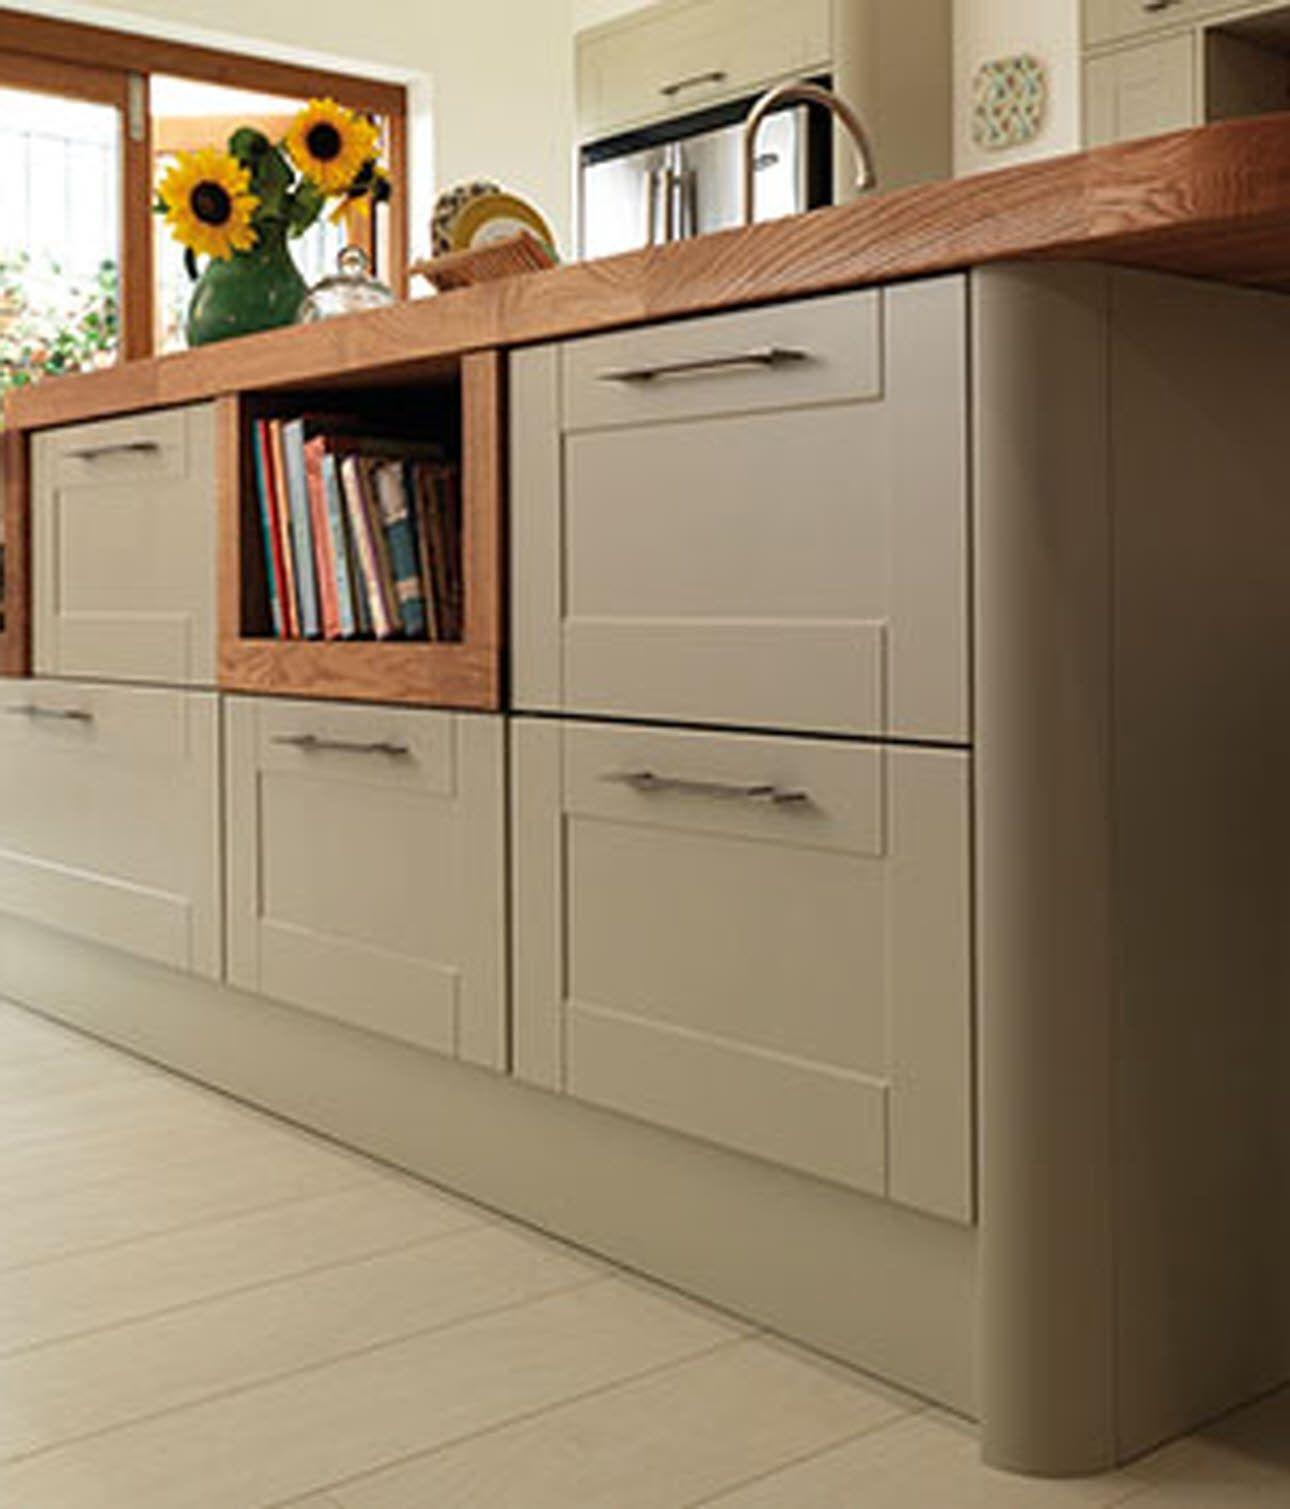 Image result for putty grey kitchen cabinets | Kitchen ...